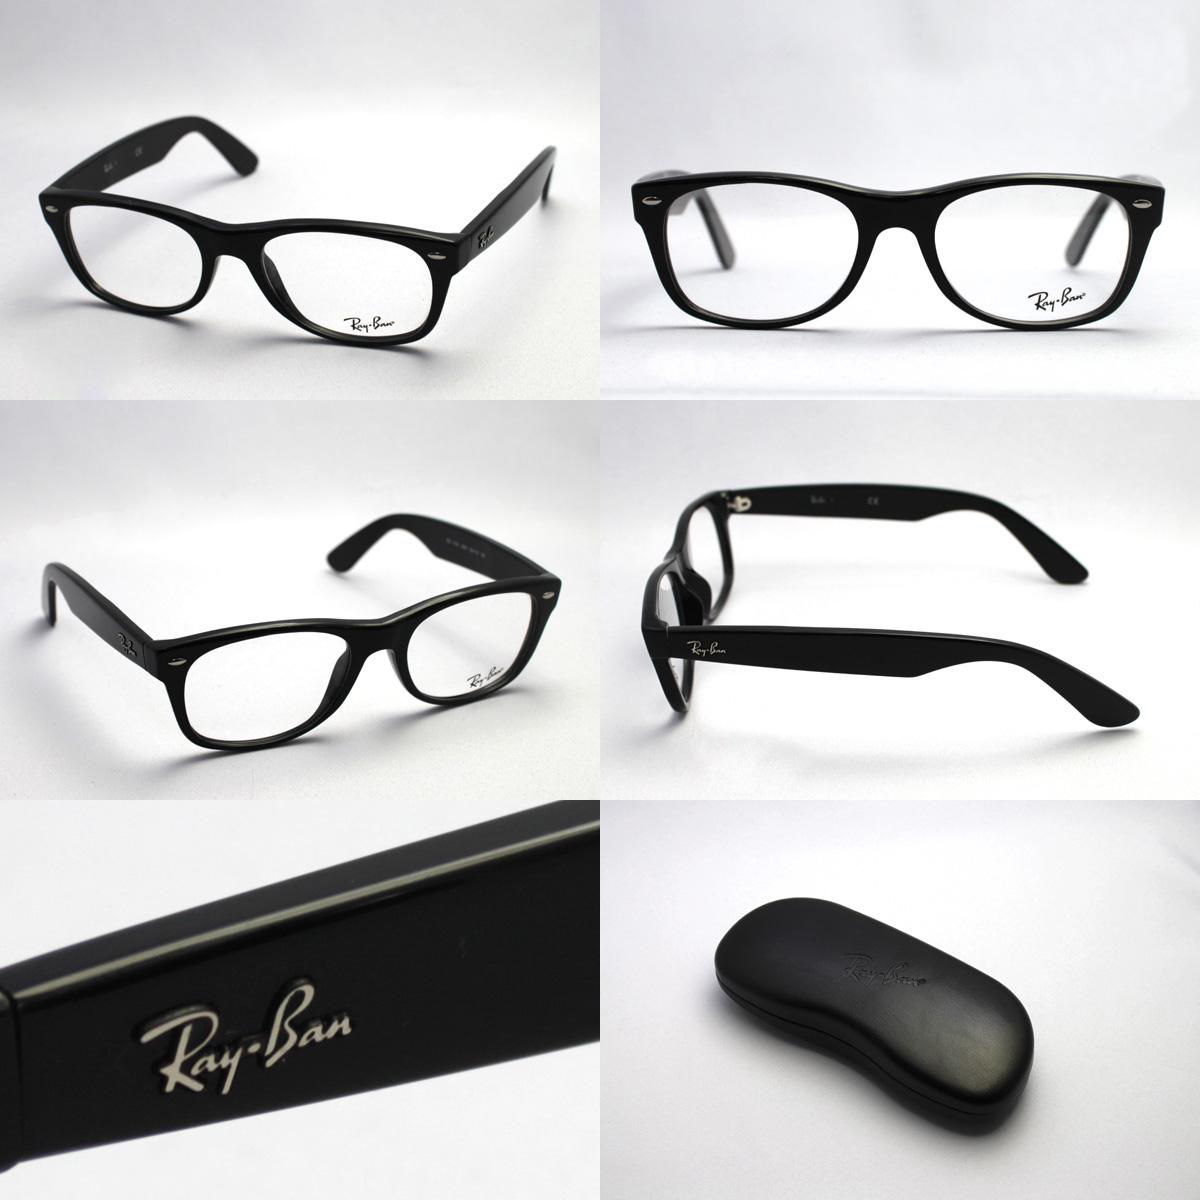 RX5184F2000 RayBan Ray Ban glasses Wayfarer glassmania New Wayfarer eyeglass frames eyeglasses ITA glasses glasses black